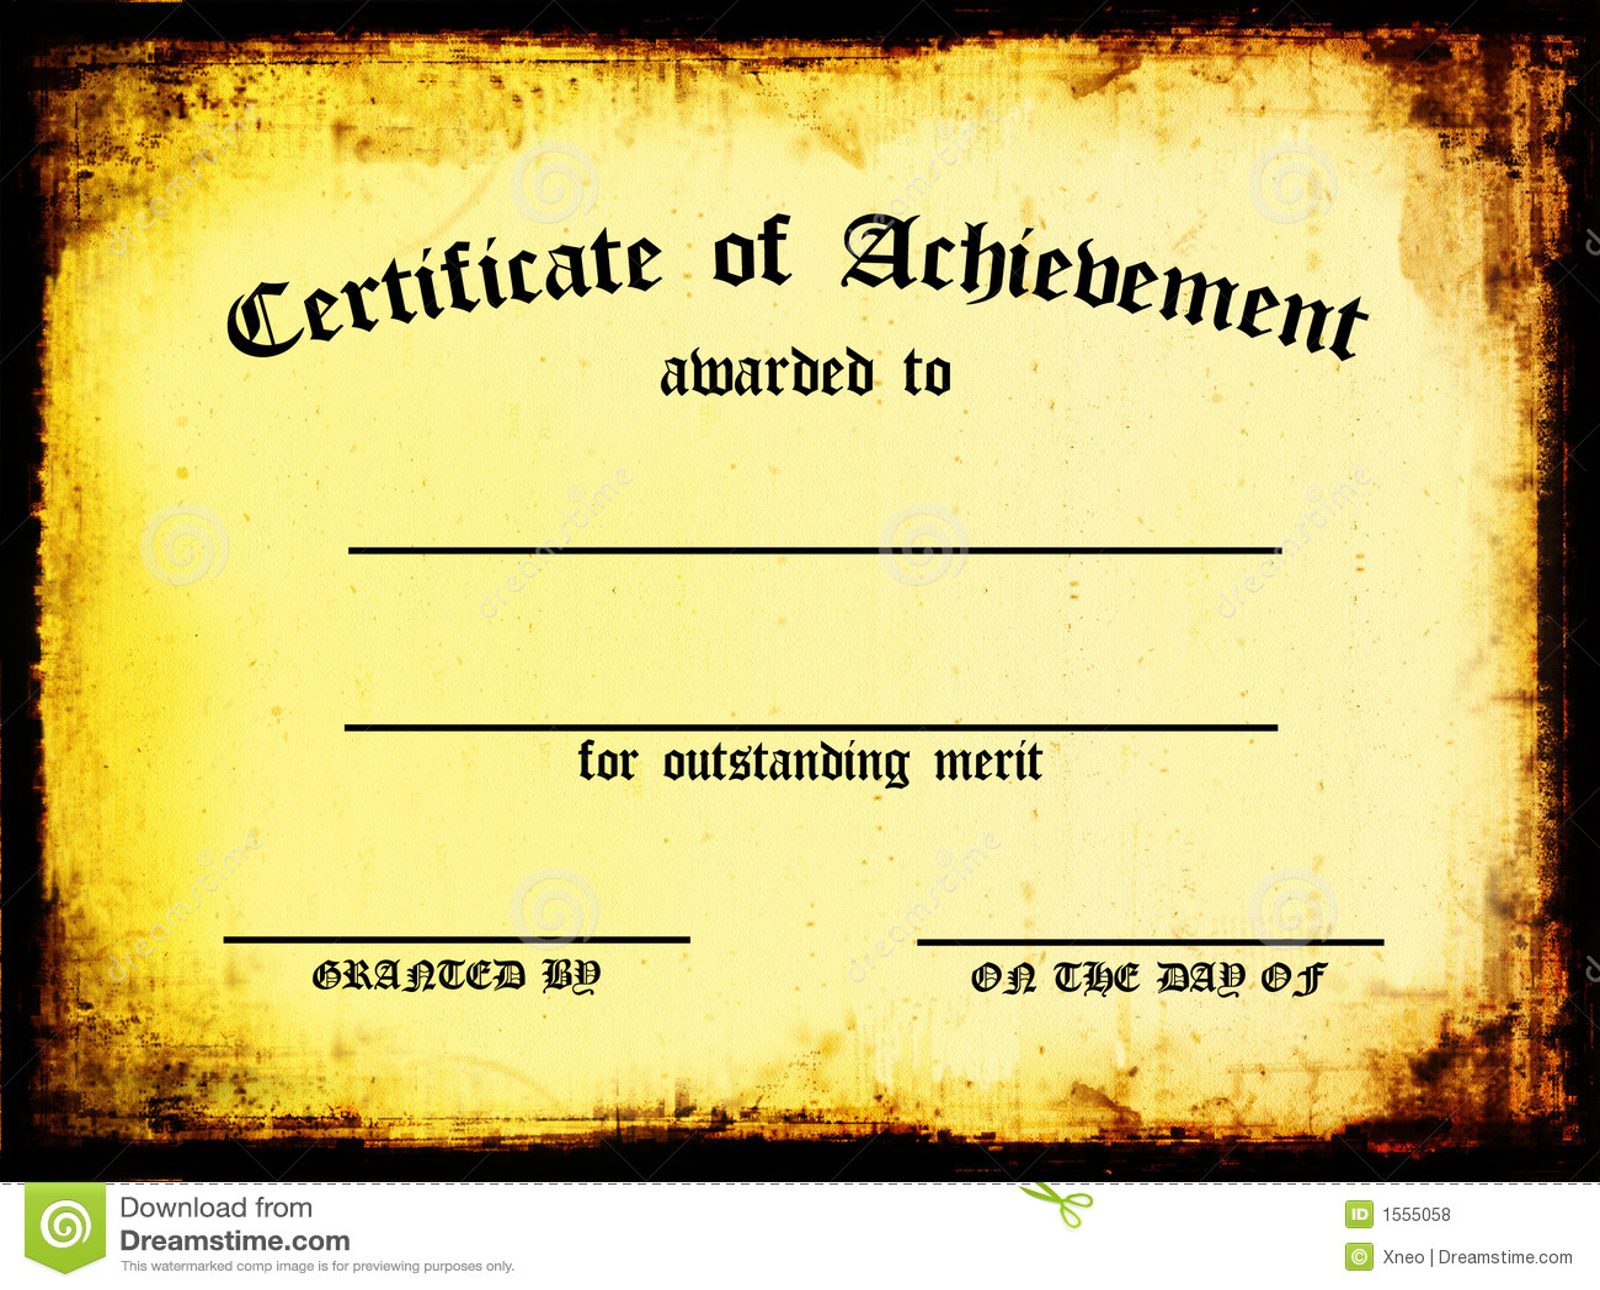 Free Certificate Of Achievement Award Template – Free Certificate of Achievement